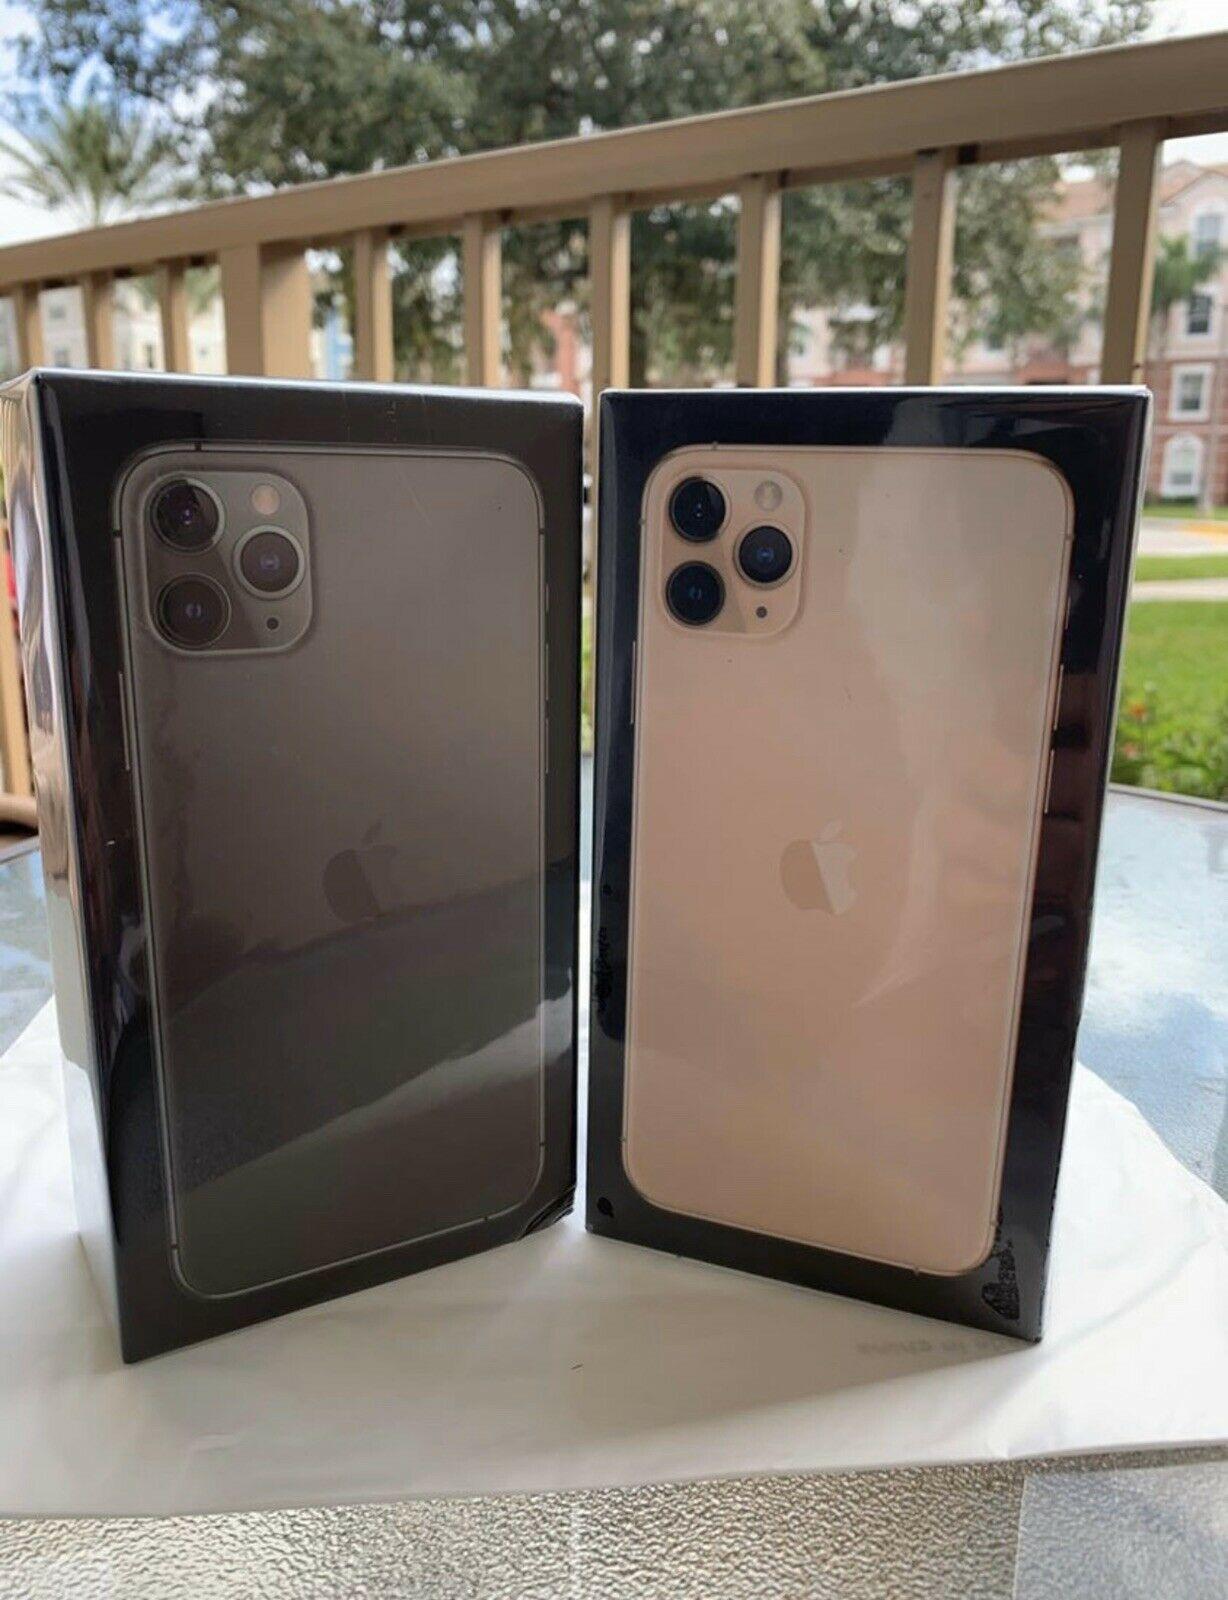 Apple iPhone 11 Pro Max - 256GB - Midnight Green (Unlocked) (CDMA + GSM)